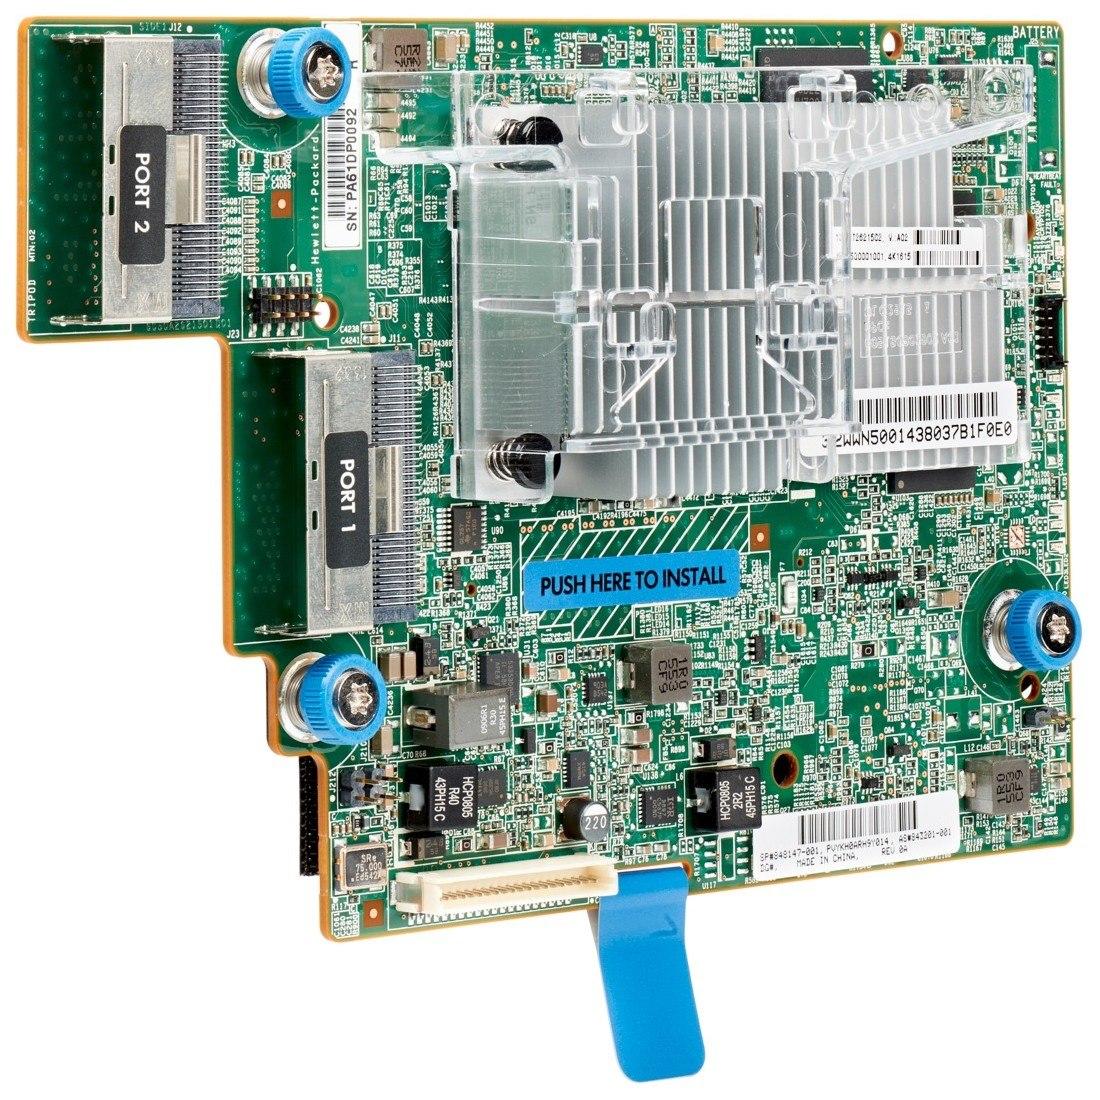 HPE Smart Array P840ar SAS Controller - 12Gb/s SAS - PCI Express 3.0 x8 - 2 GB Flash Backed Cache - Plug-in Card